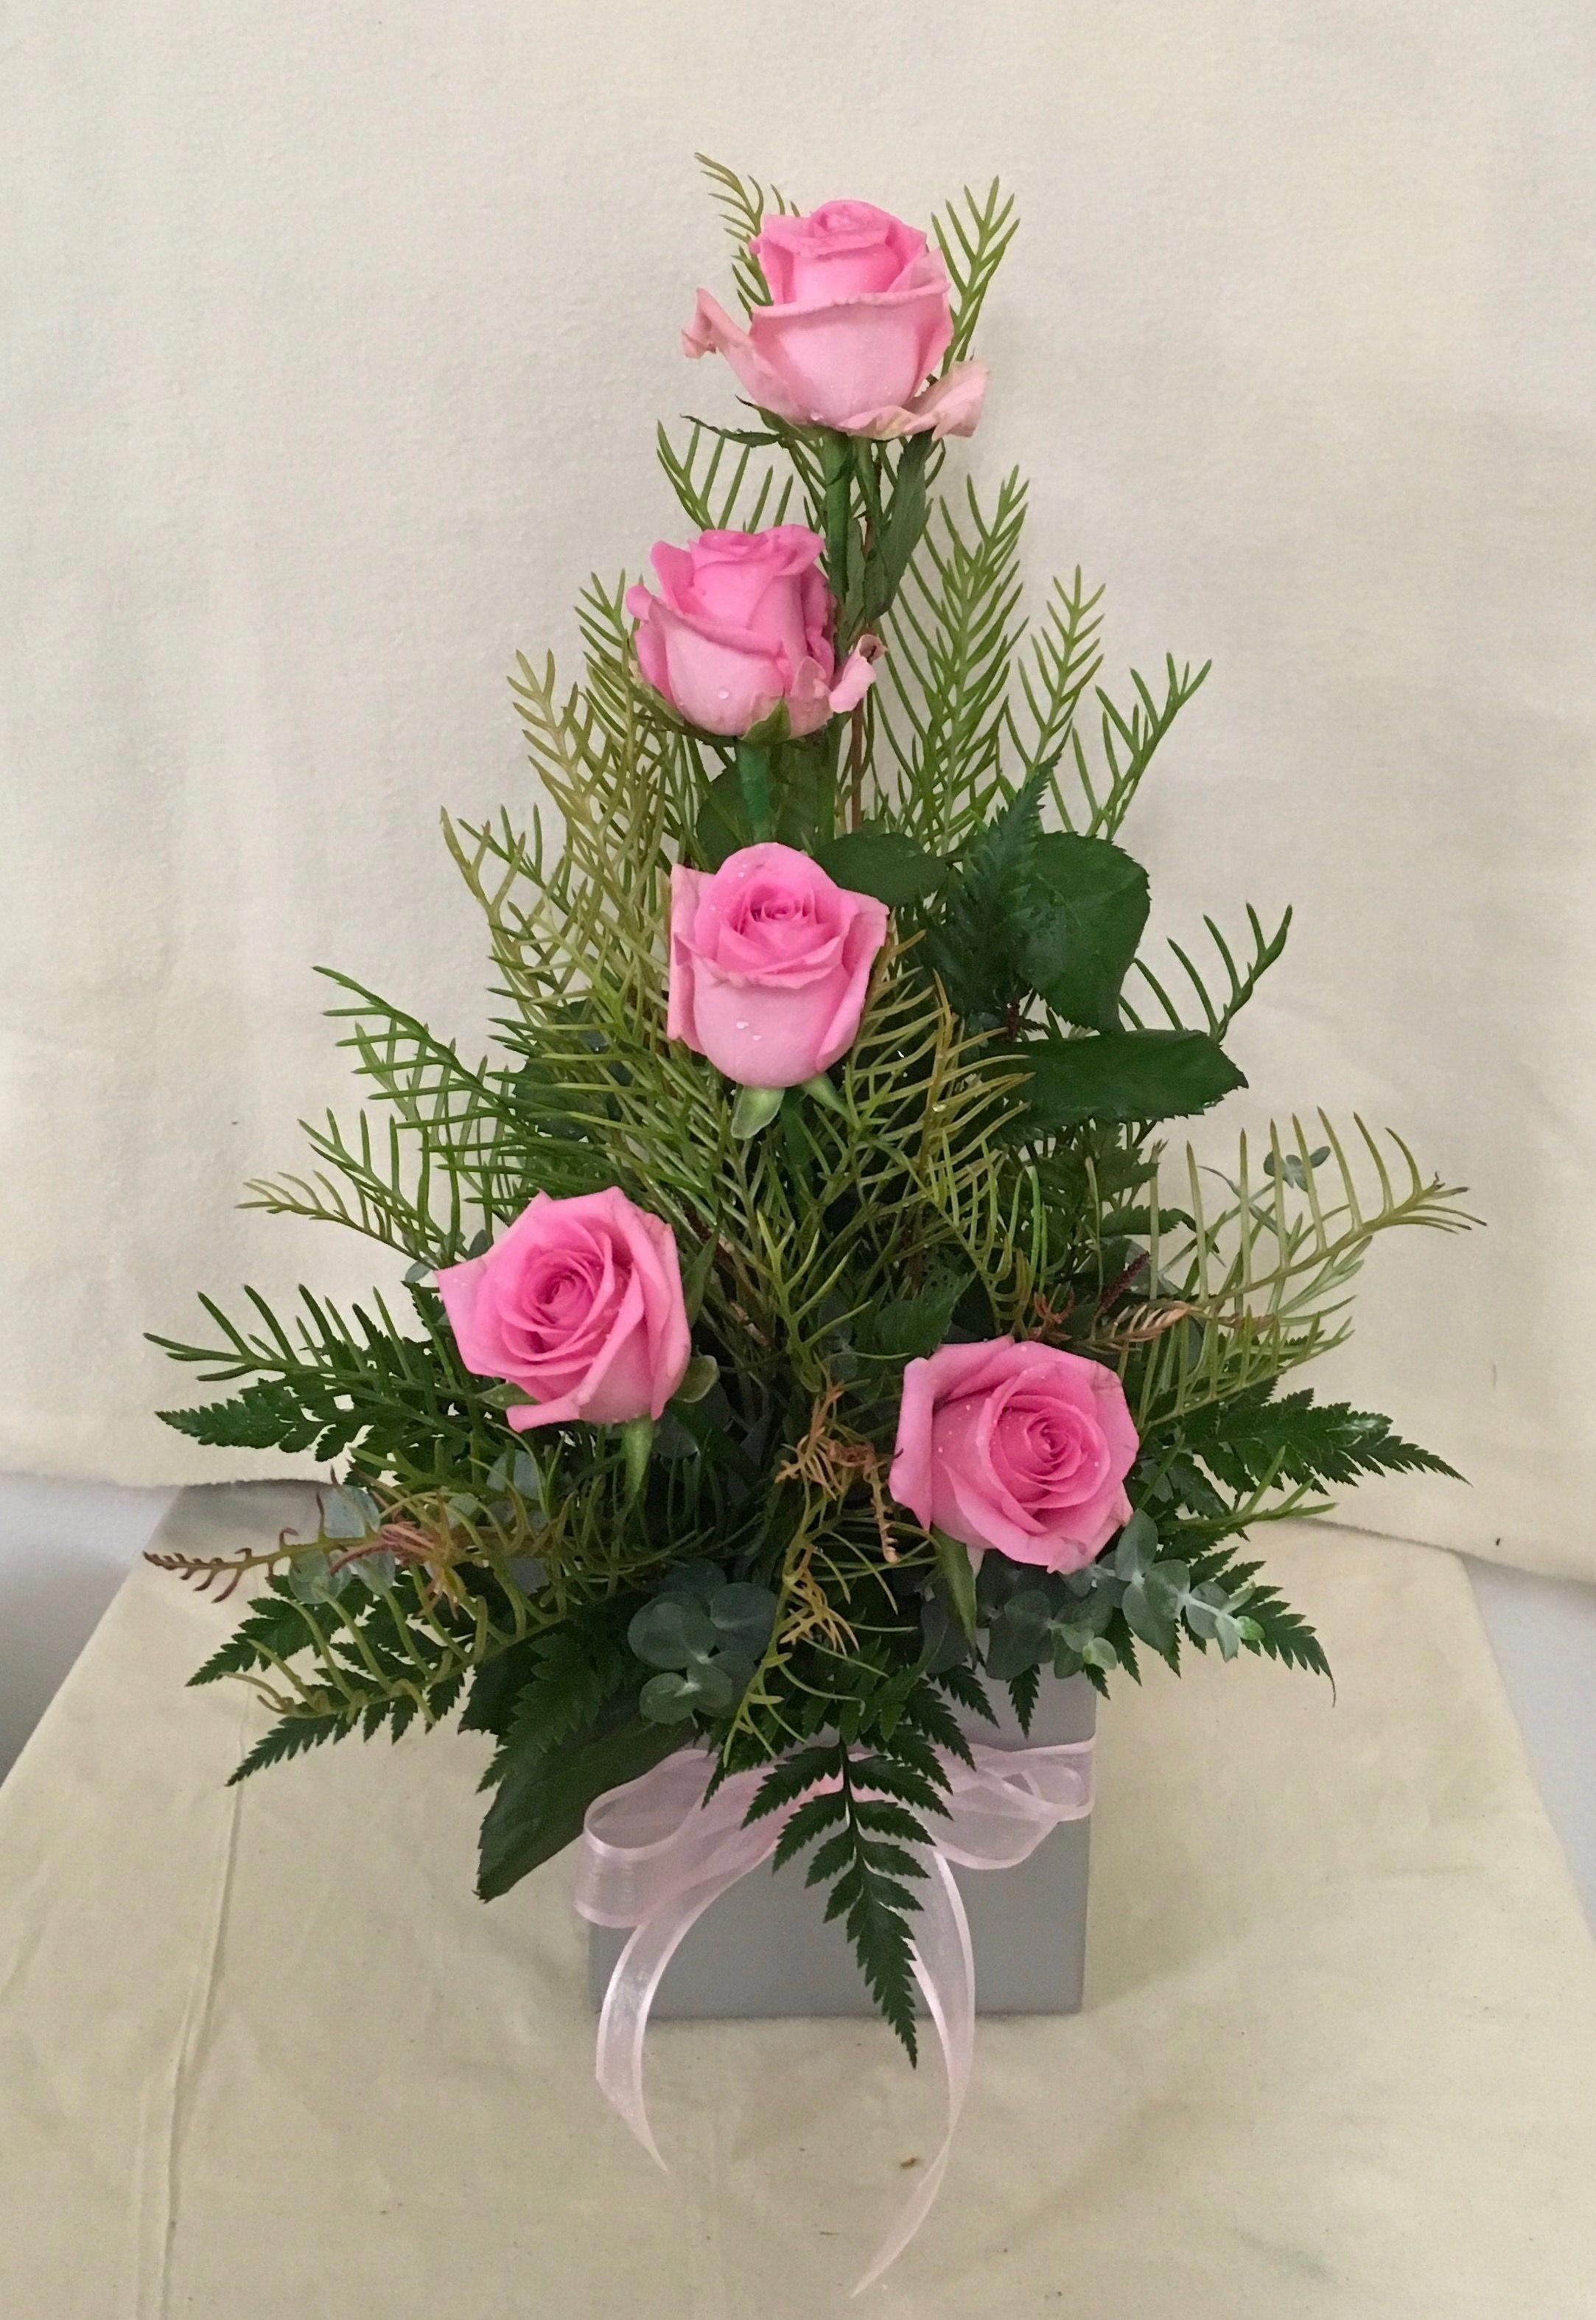 Pin By Fabulous Wedding Ideas On Church Wedding Flower Ideas Flower Arrangements Simple Rose Flower Arrangements Flower Arrangements